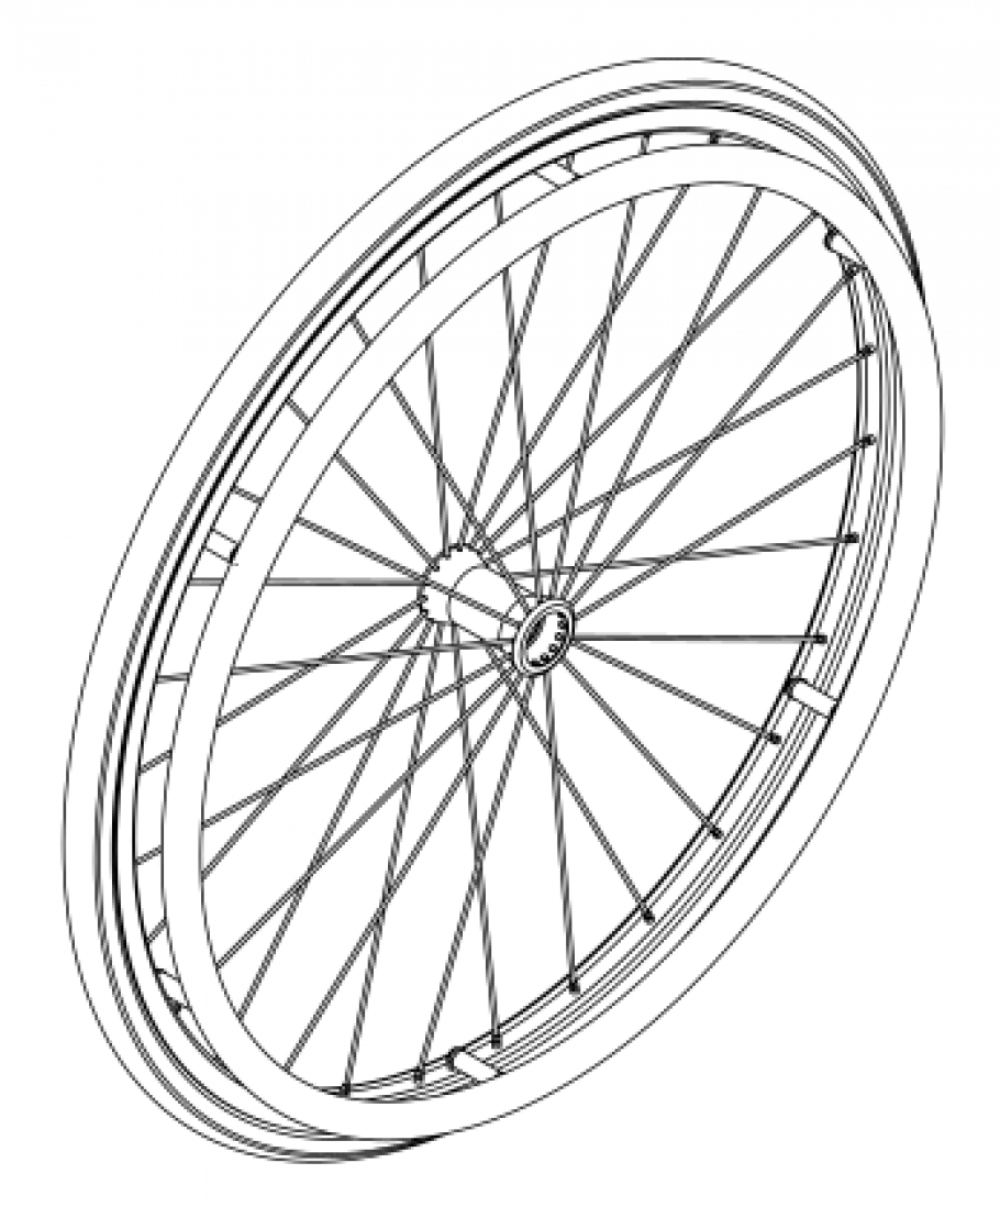 (discontinued) Catalyst Spoke Wheel / Tire / Handrim Kits parts diagram